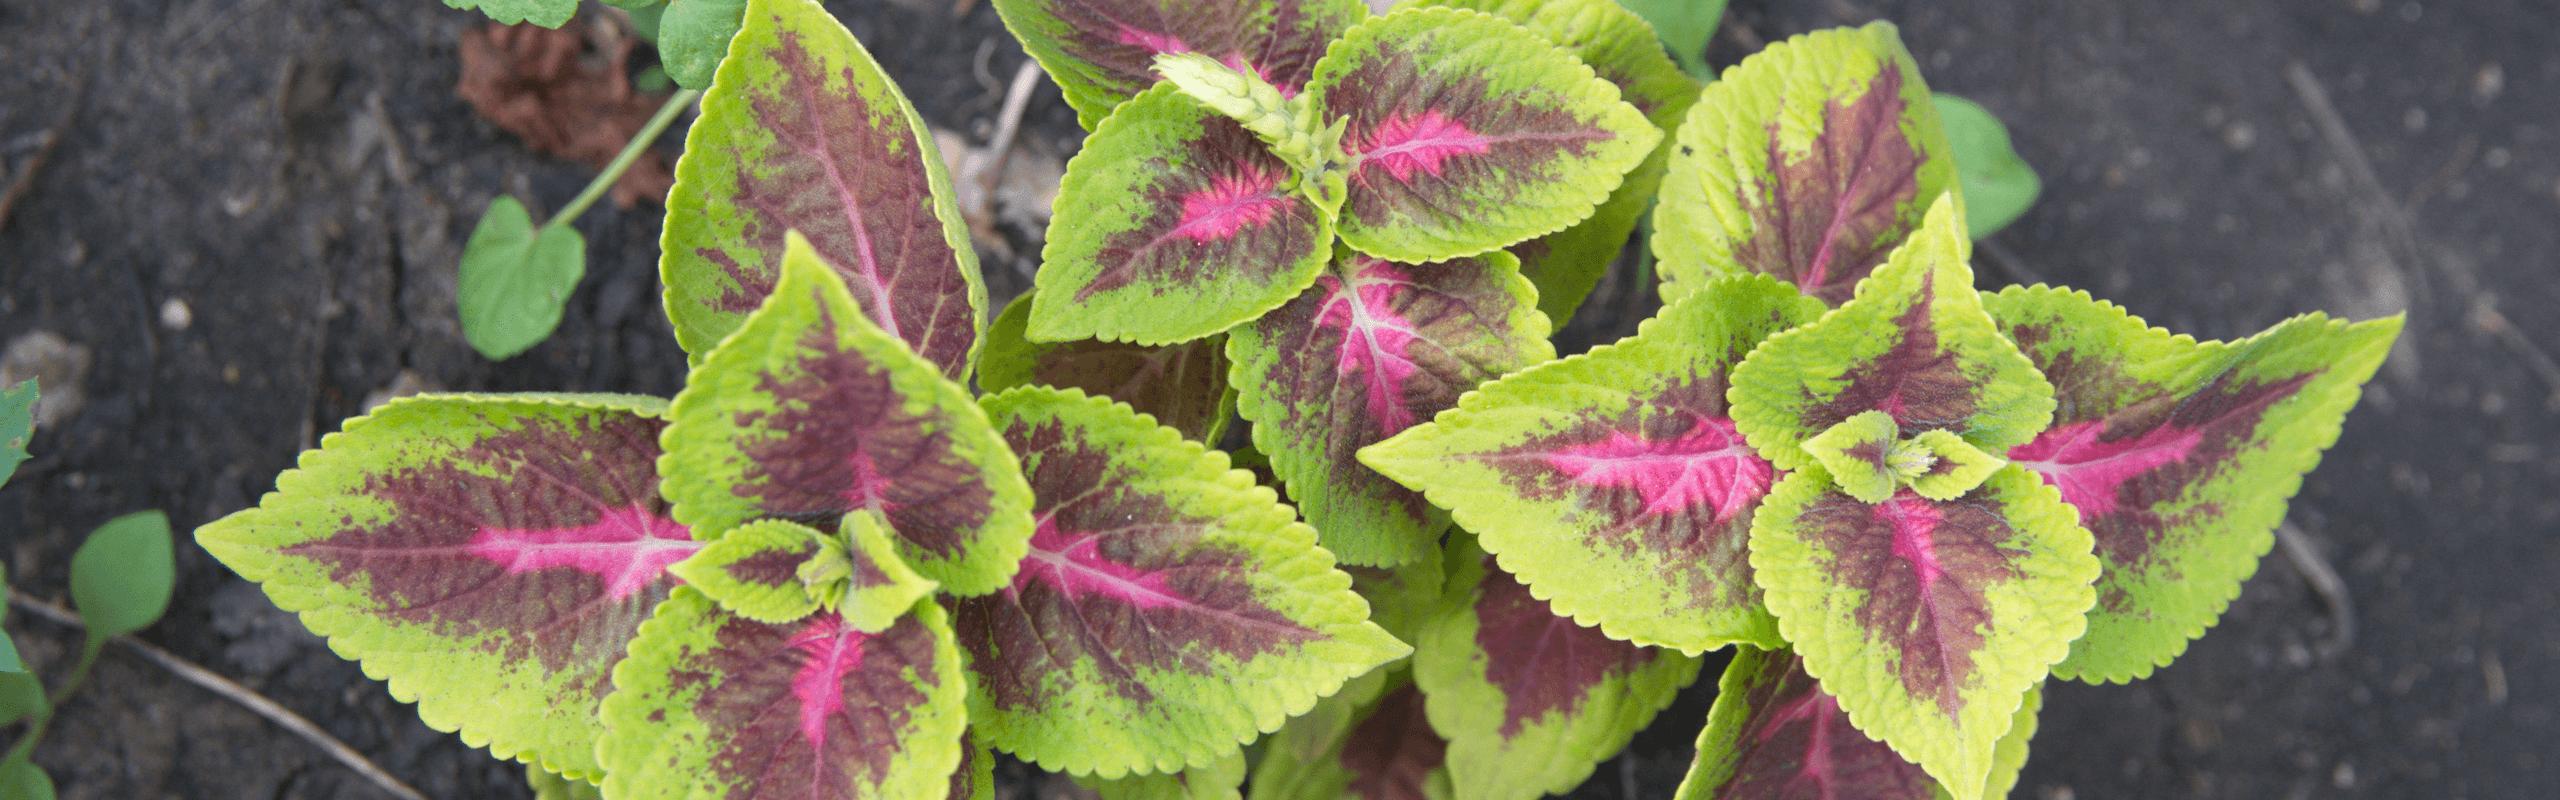 herbs for heart health - coleus